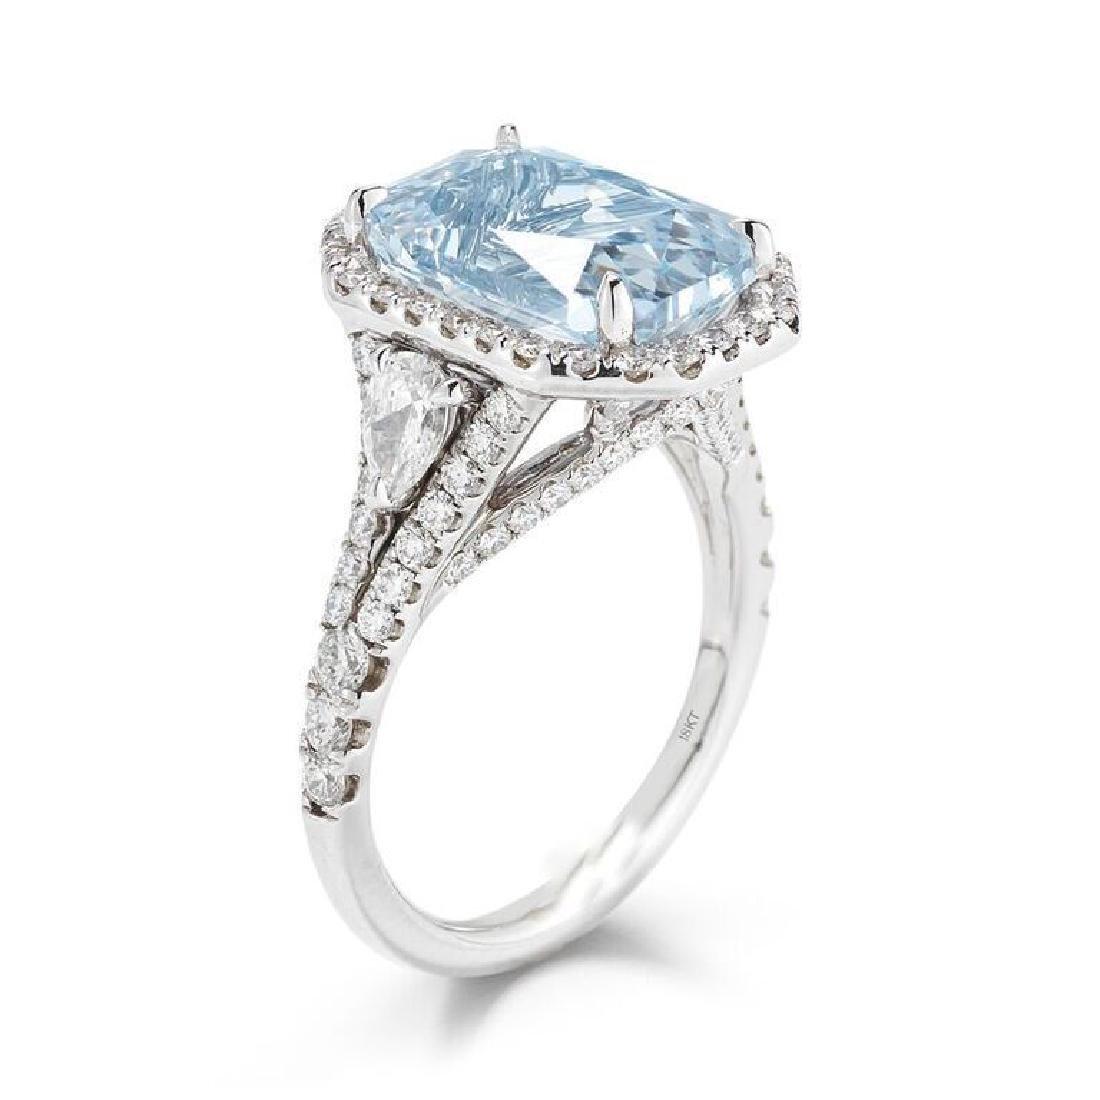 C.DUNAIGRE CERTIFIED ICY BLUE SAPPHIRE RING